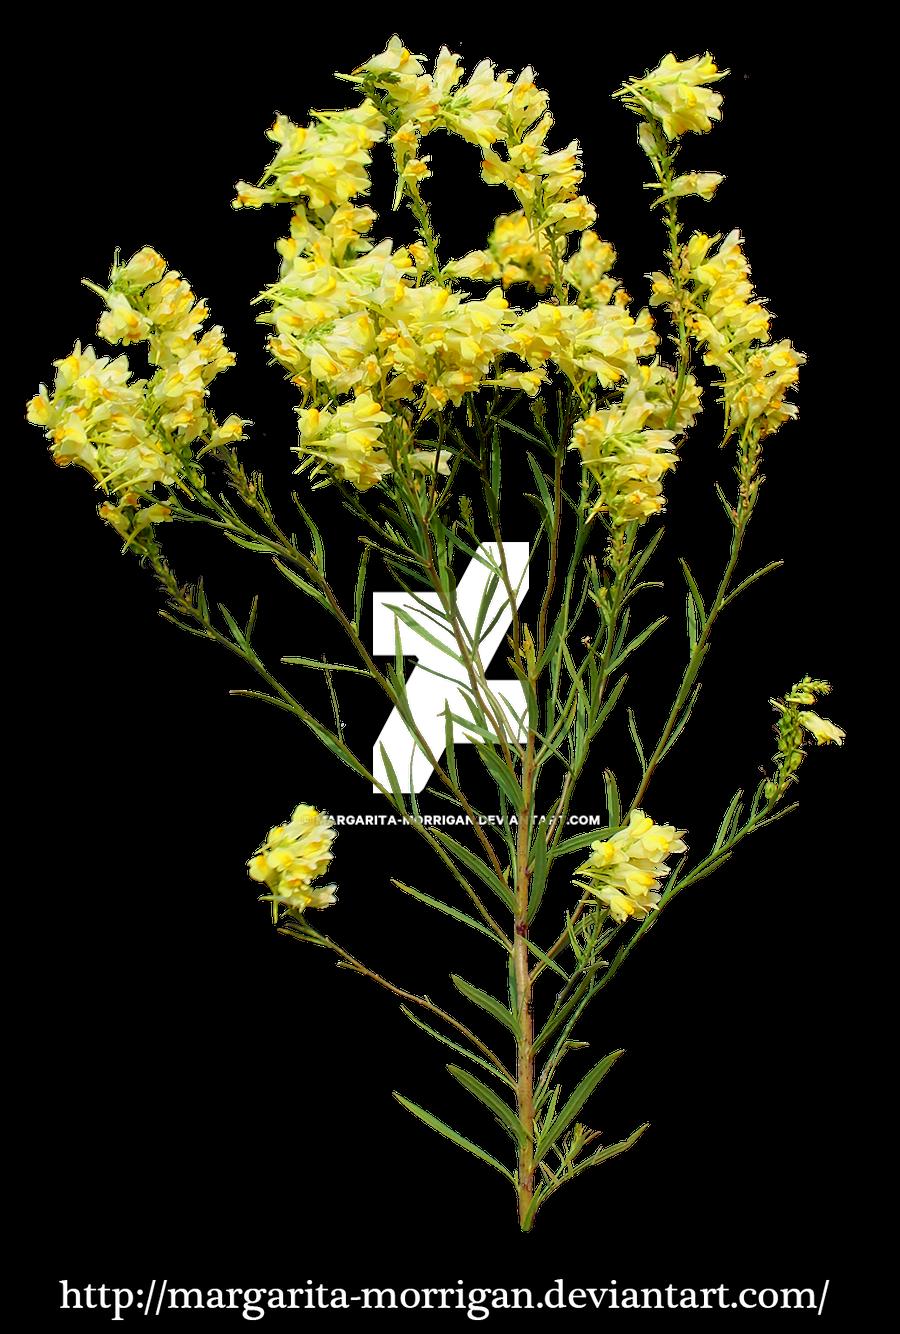 Yellow flowers by margarita morrigan on deviantart - Trees that bloom yellow flowers ...